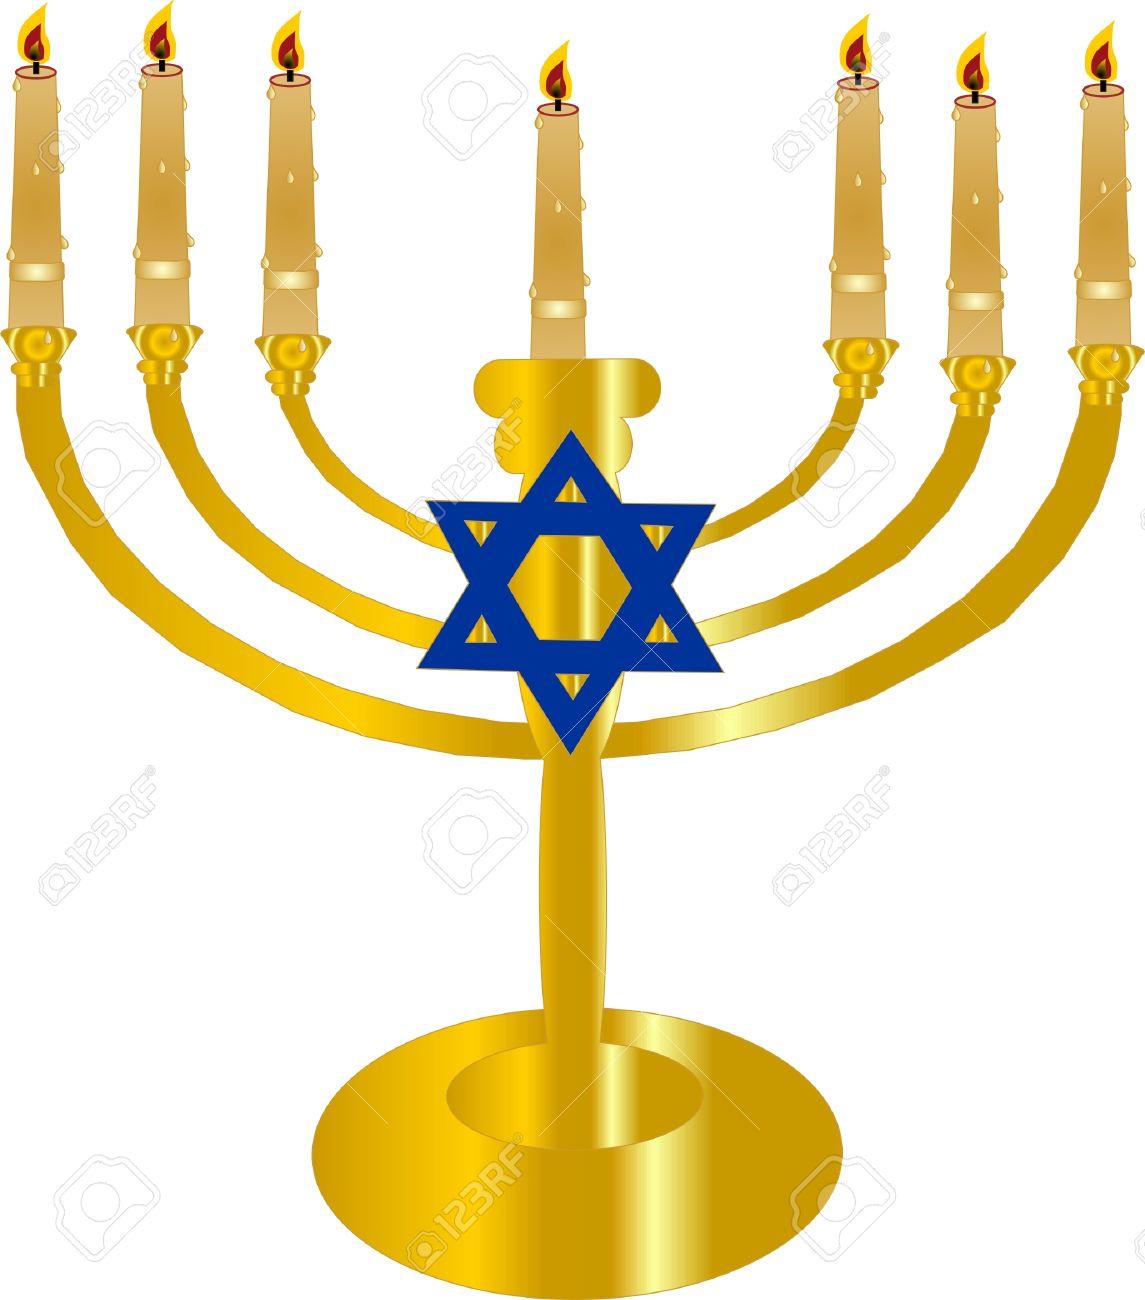 The 7 branch menorah symbol of jewish faith royalty free cliparts the 7 branch menorah symbol of jewish faith stock vector 4225267 biocorpaavc Image collections